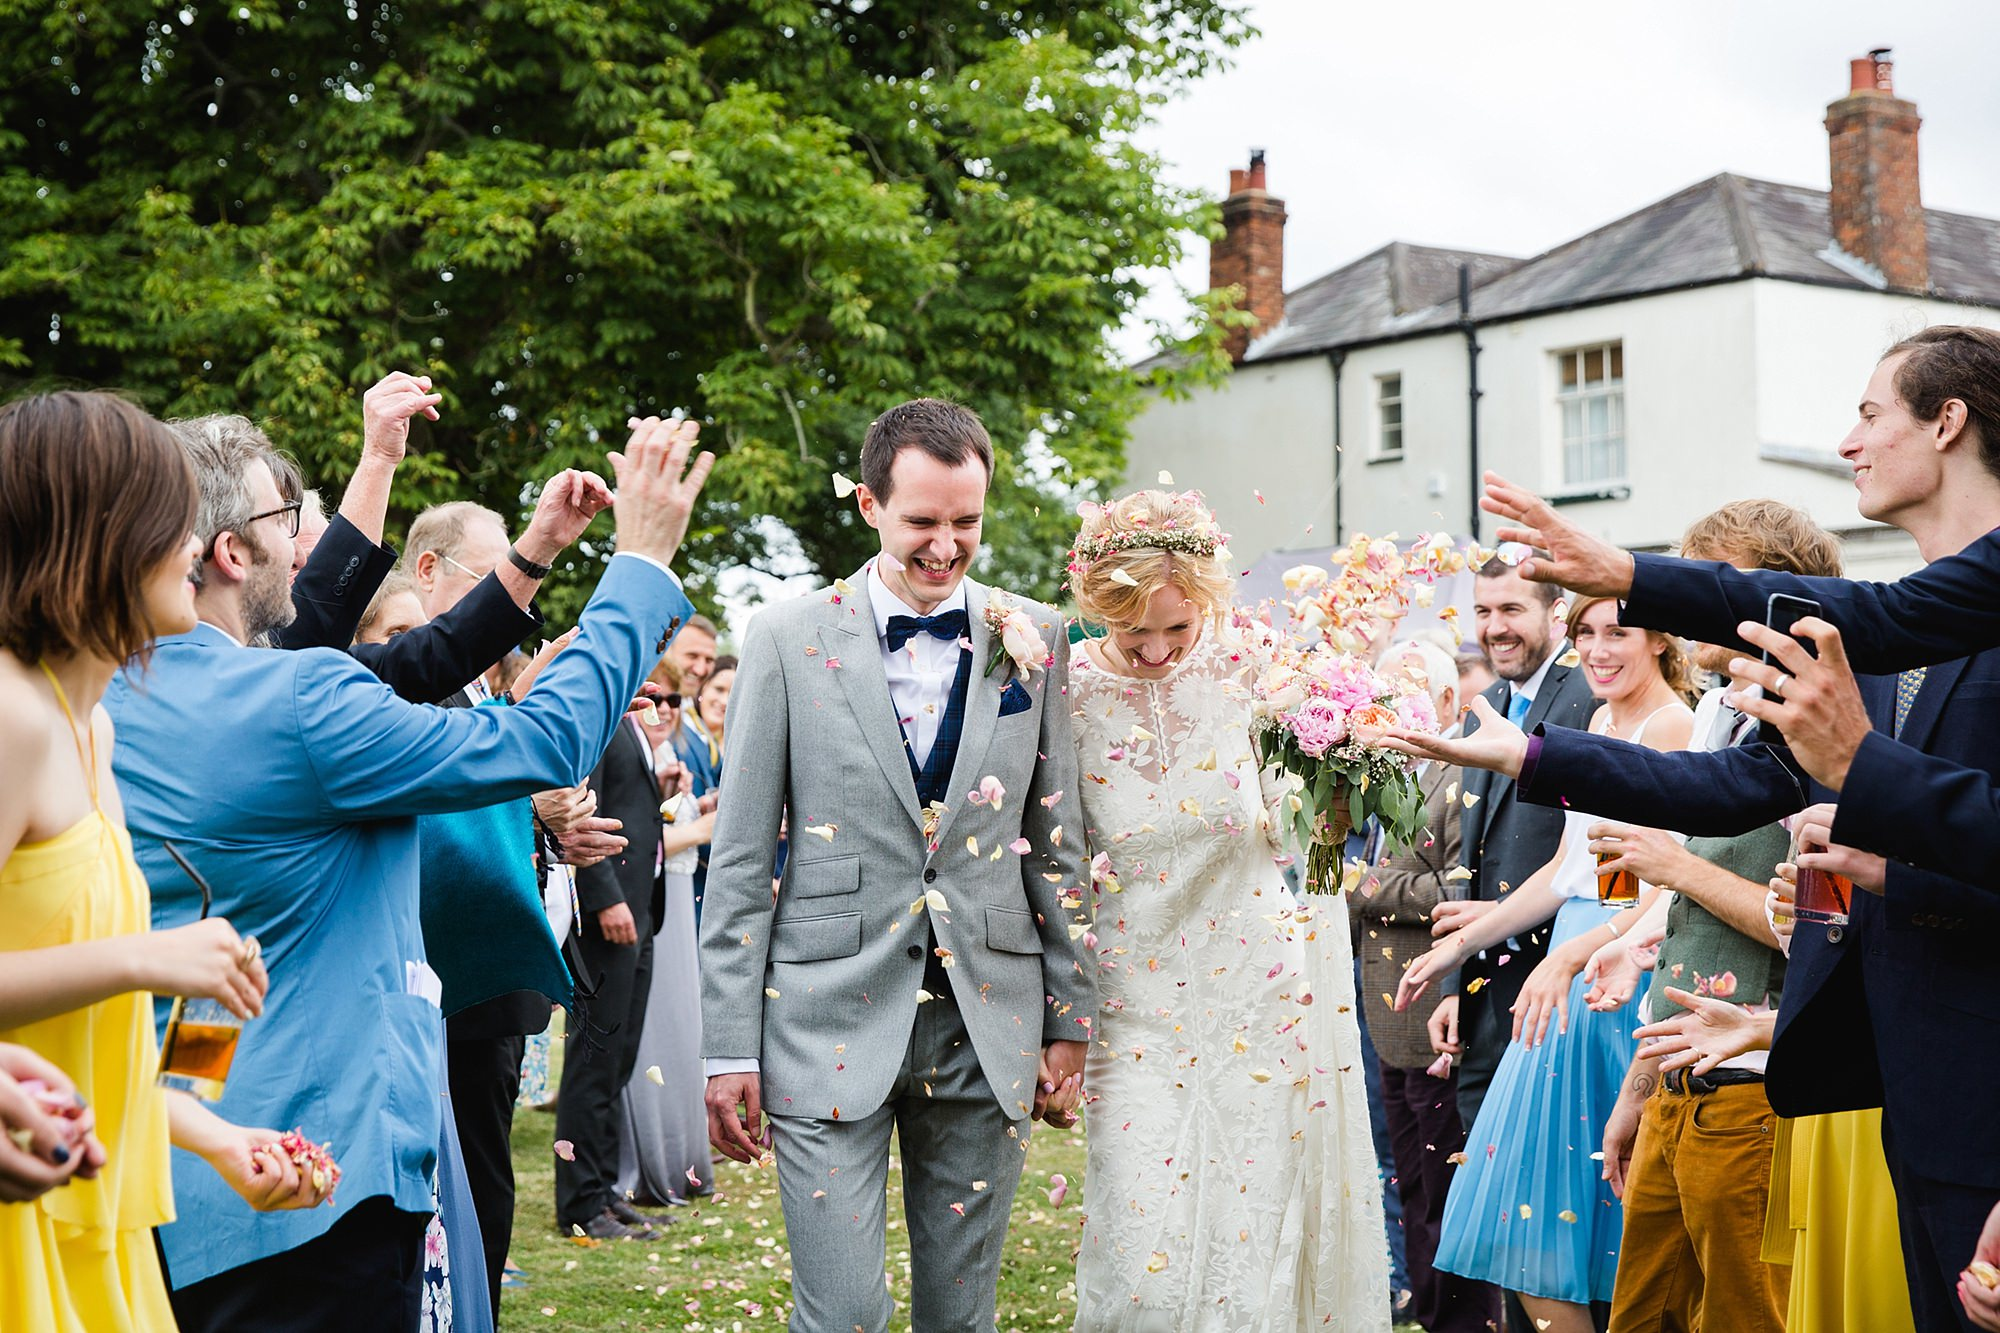 Isis Farmhouse Oxford Wedding bride and groom walking through thrown confetti